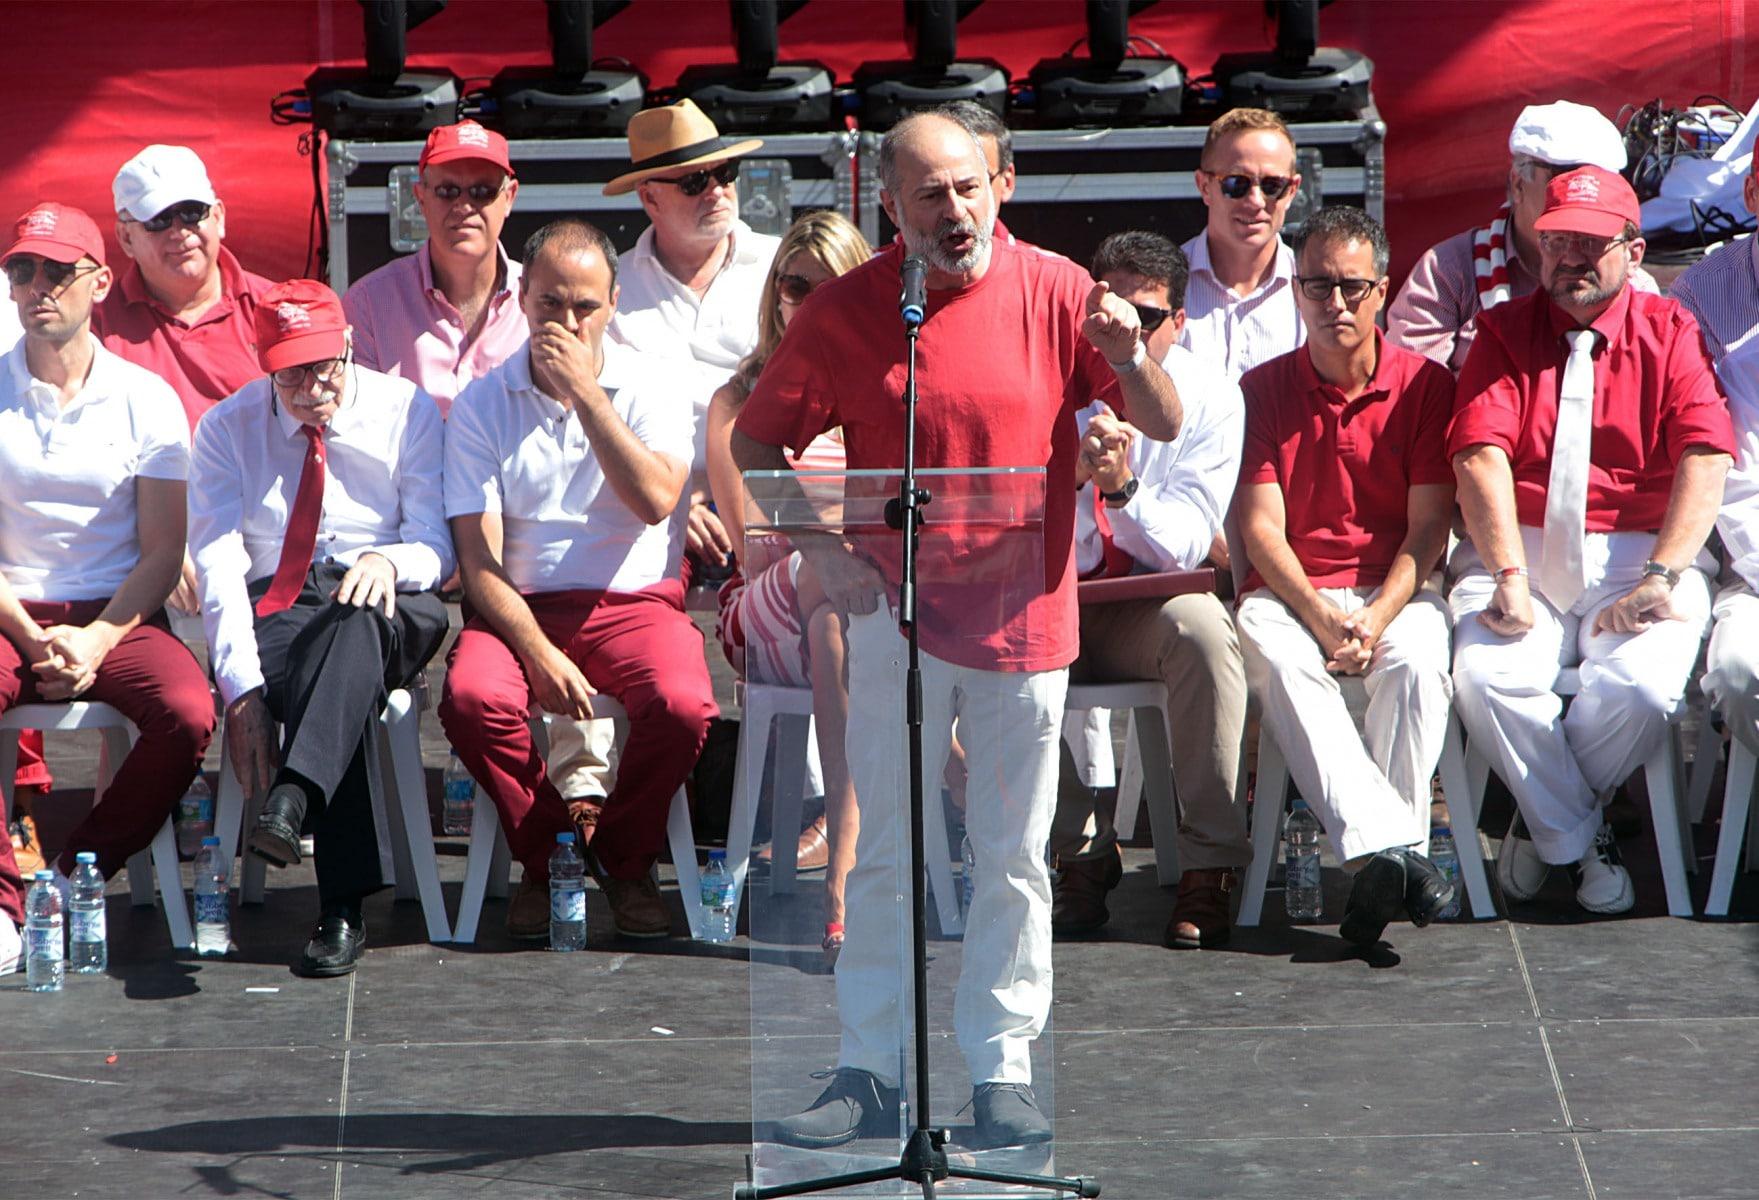 160910-national-day-gibraltar-2016-27_29605147855_o